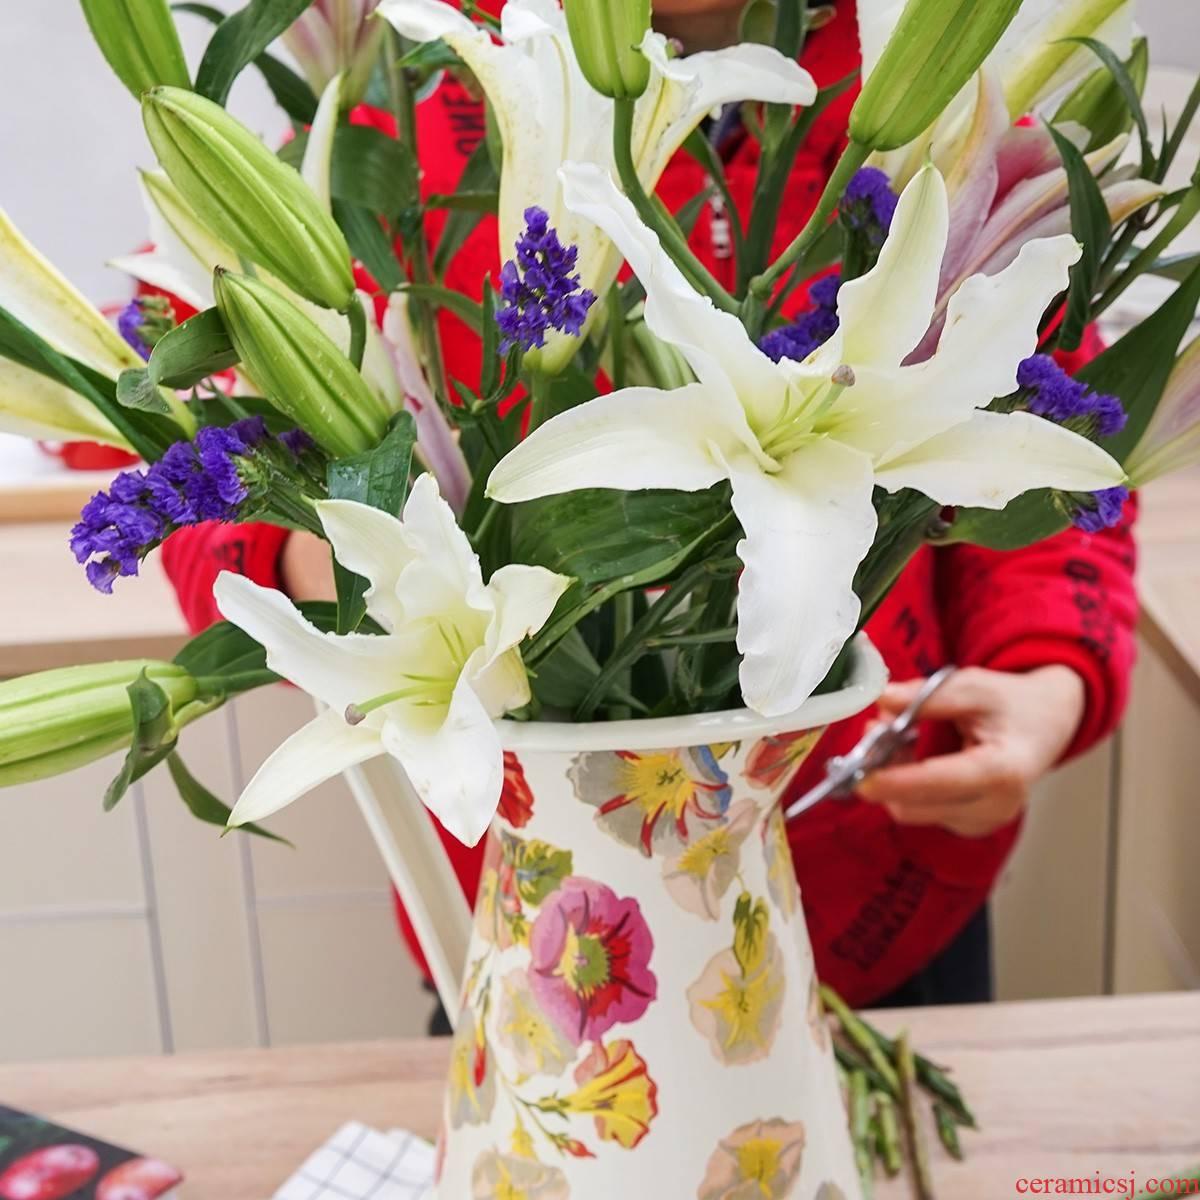 Japan fatty dragon flowers with thick enamel 3.5 L household enamel export large vase bottle decoration